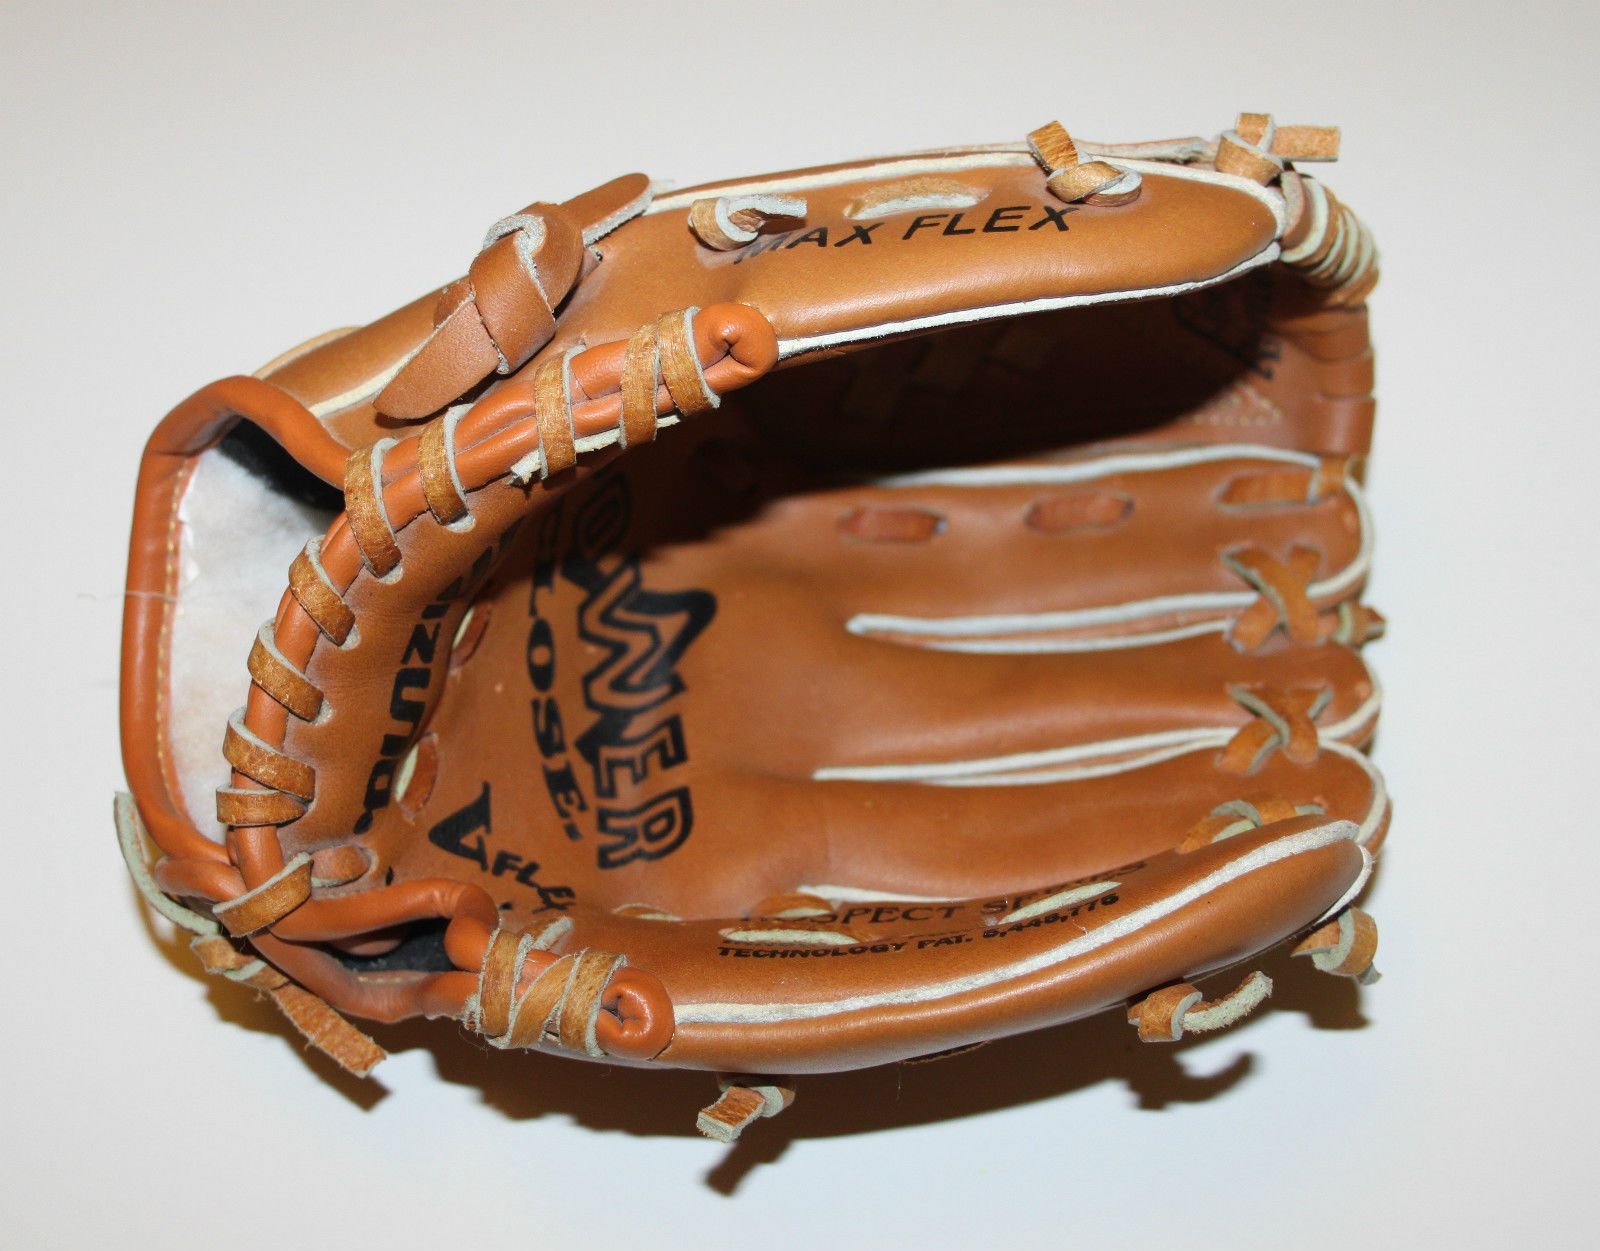 Leather driving gloves on ebay - Mizuno Baseball Power Close Max Flex Leather Glove Mitt 9 Youth Mpr